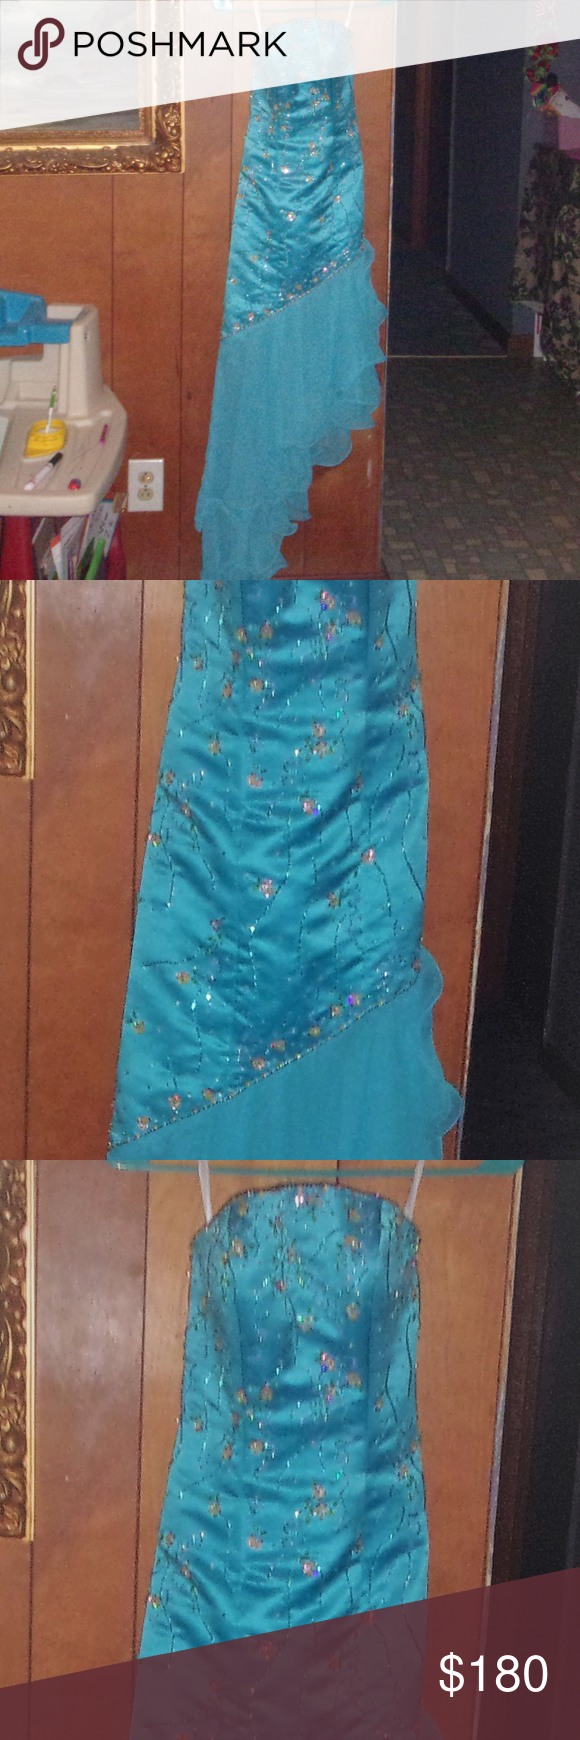 Pageant prom dress size bling aqua strapless my posh picks